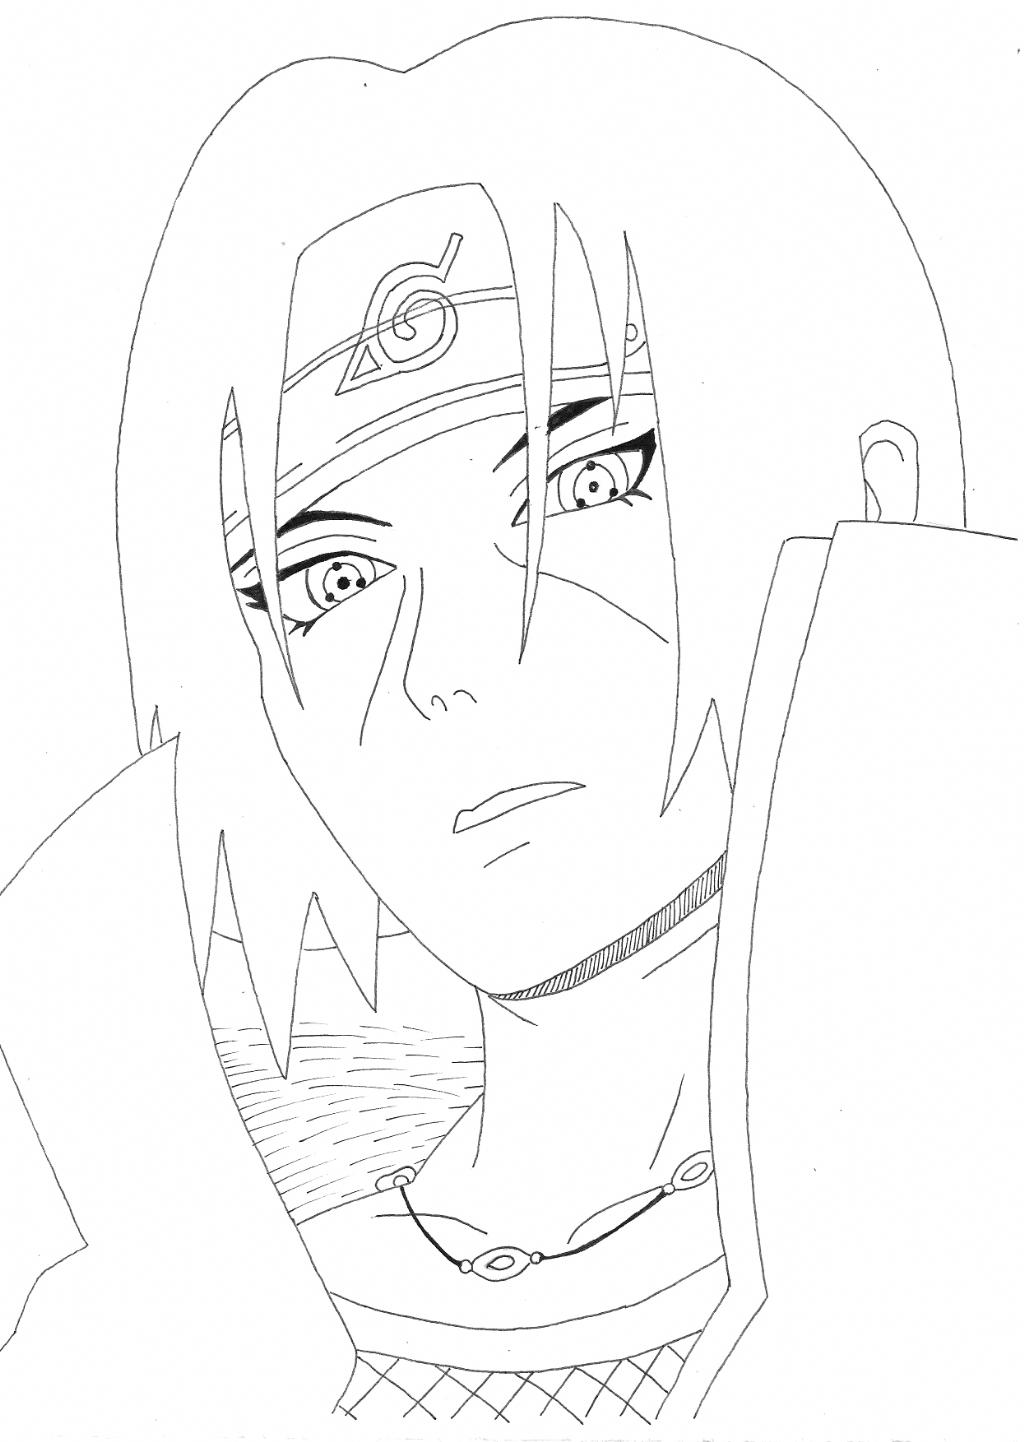 Pin By Isaiah Trujillo On Naruto Itachi Uchiha Art Naruto Sketch Drawing Naruto Sketch